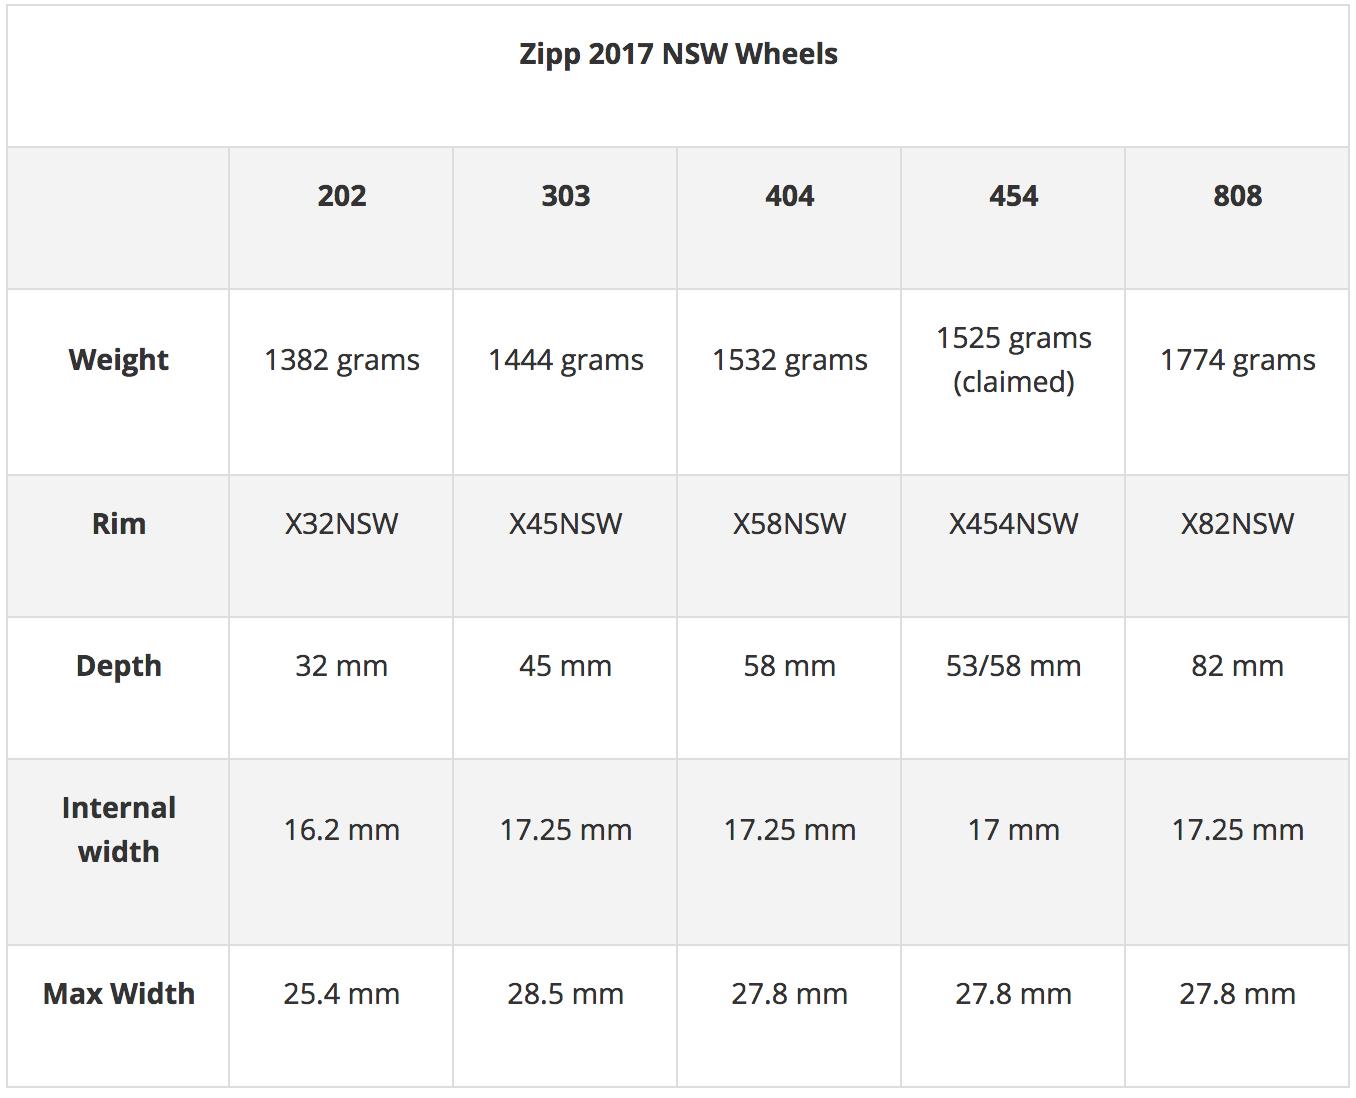 Zipp 2017 NSW Wheels